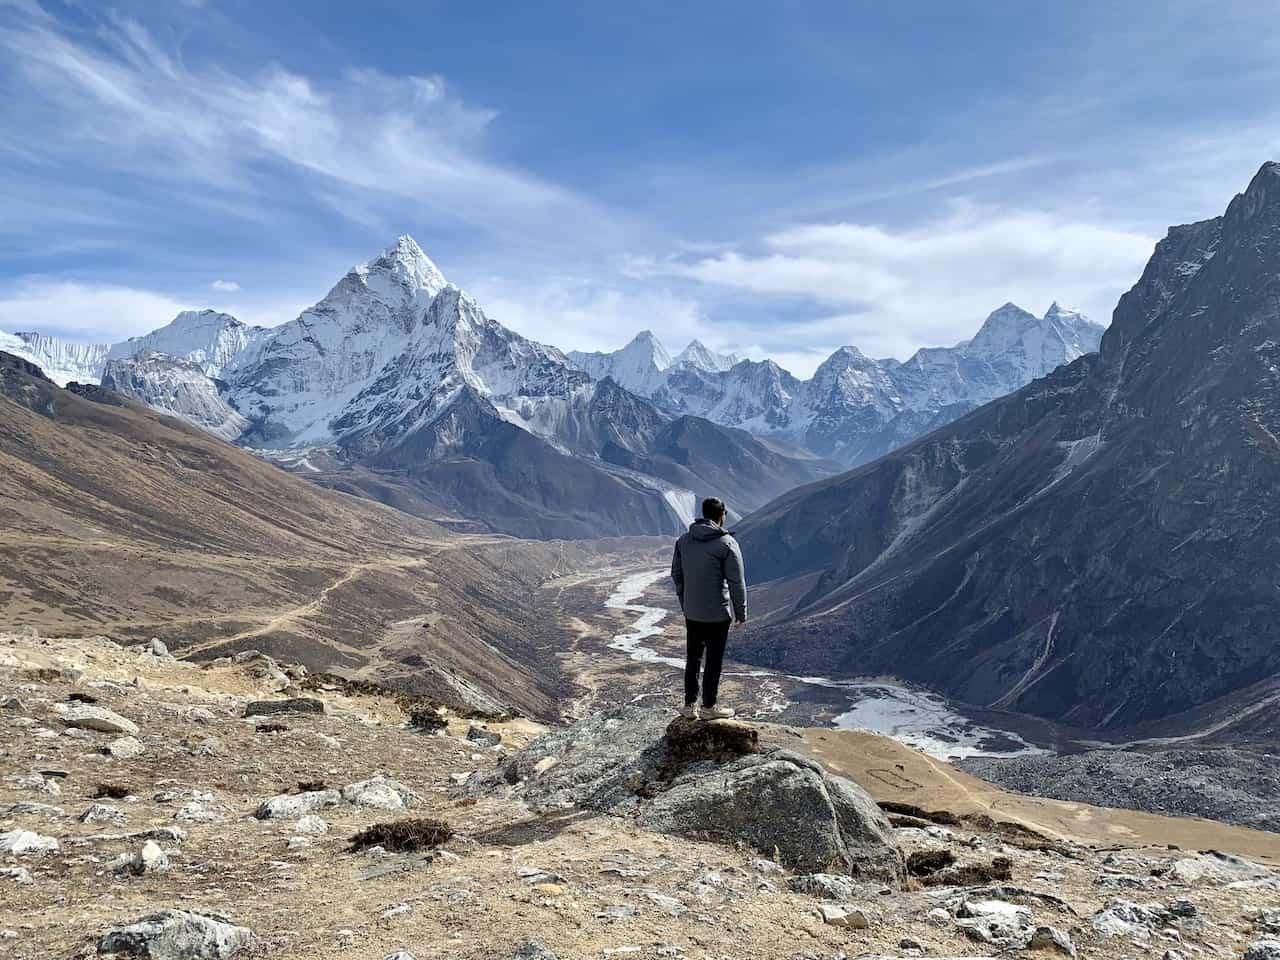 Pheriche Everest Base Camp